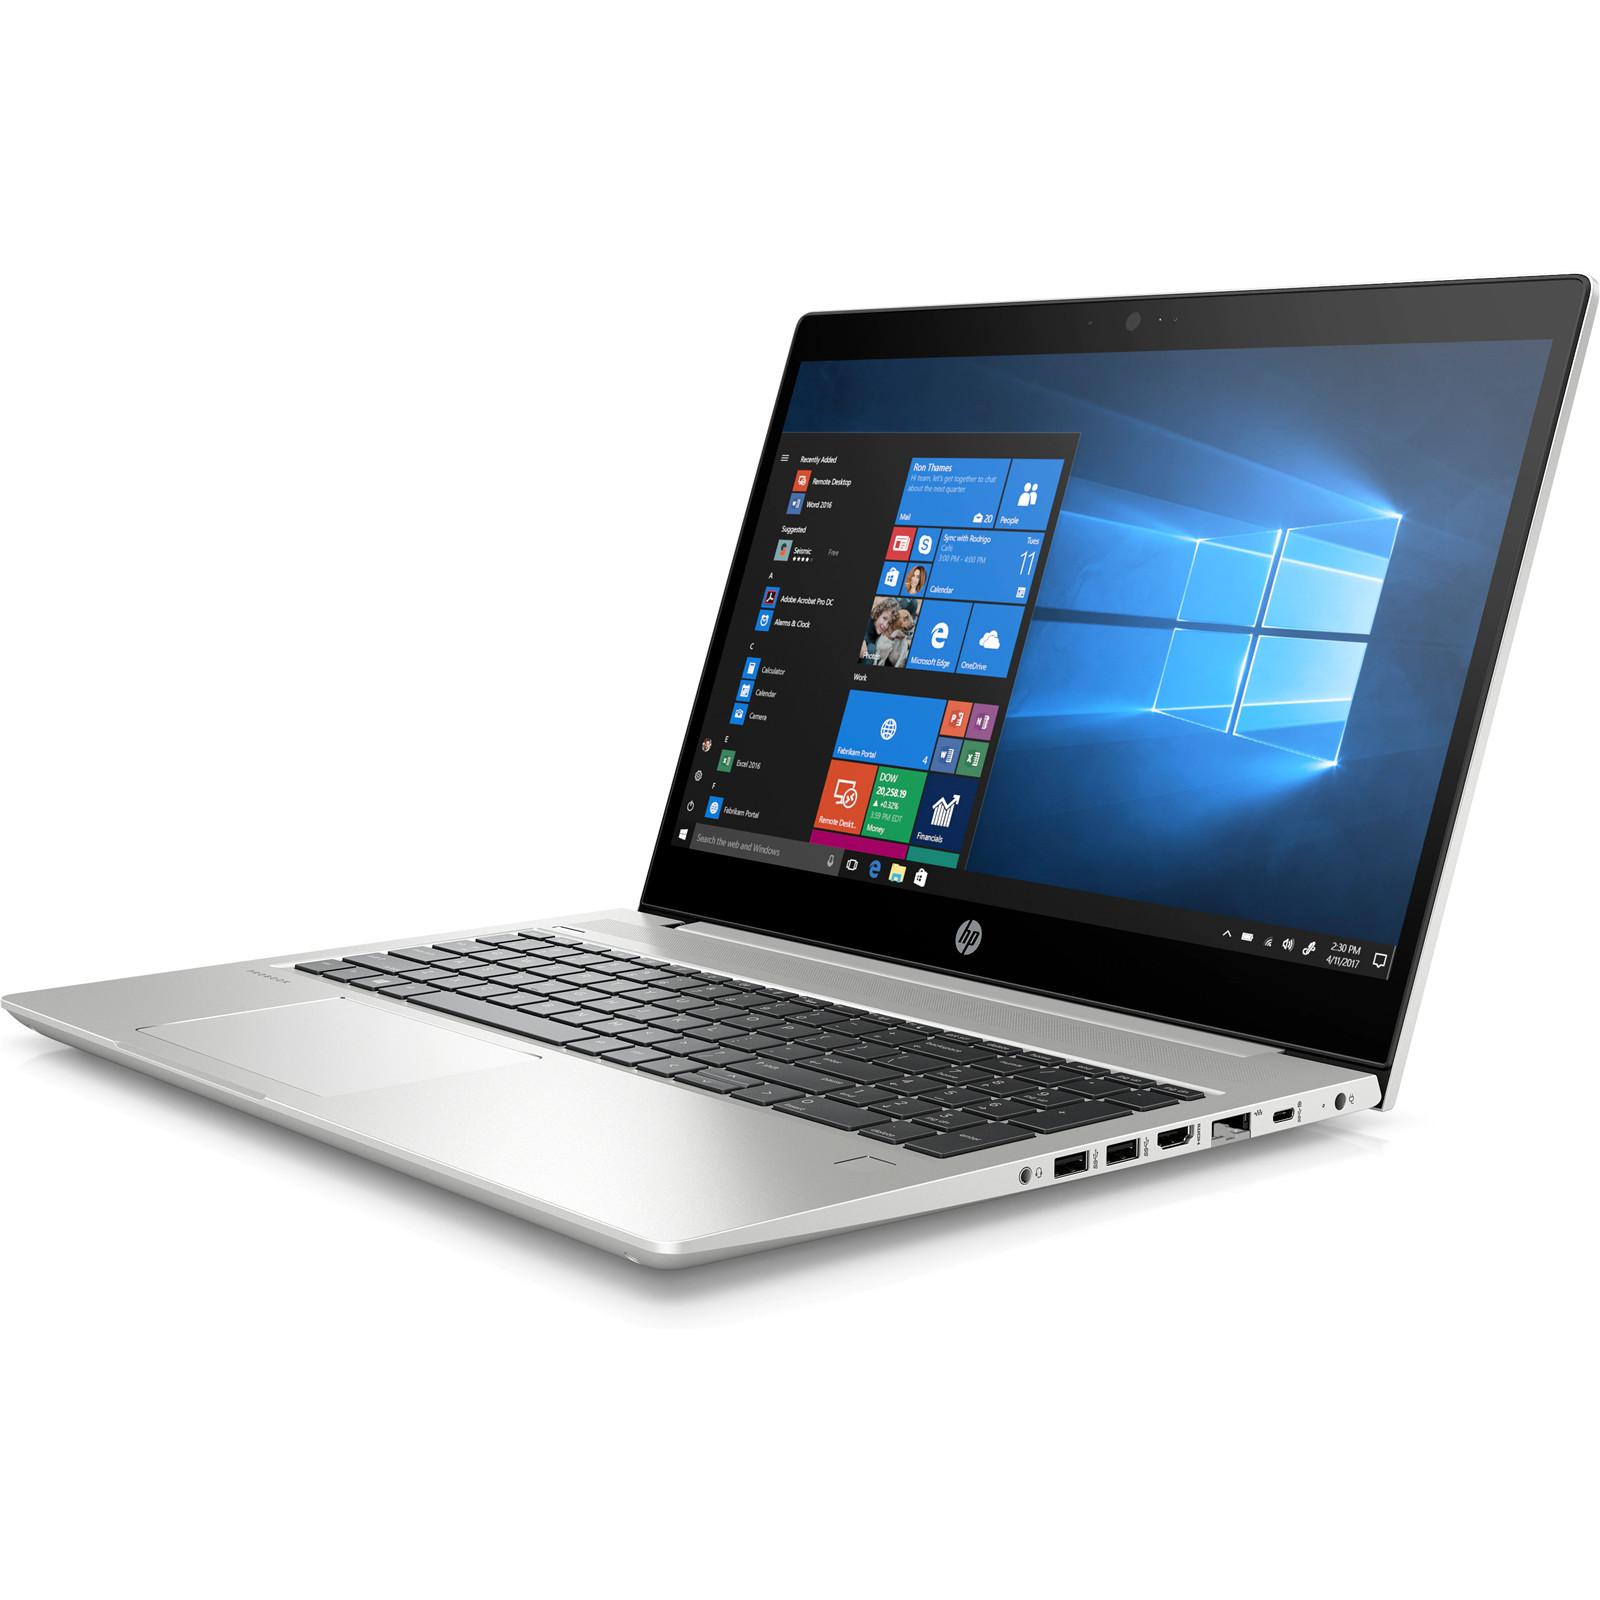 Buy the HP Probook 450 G6 Business Laptop 15 6